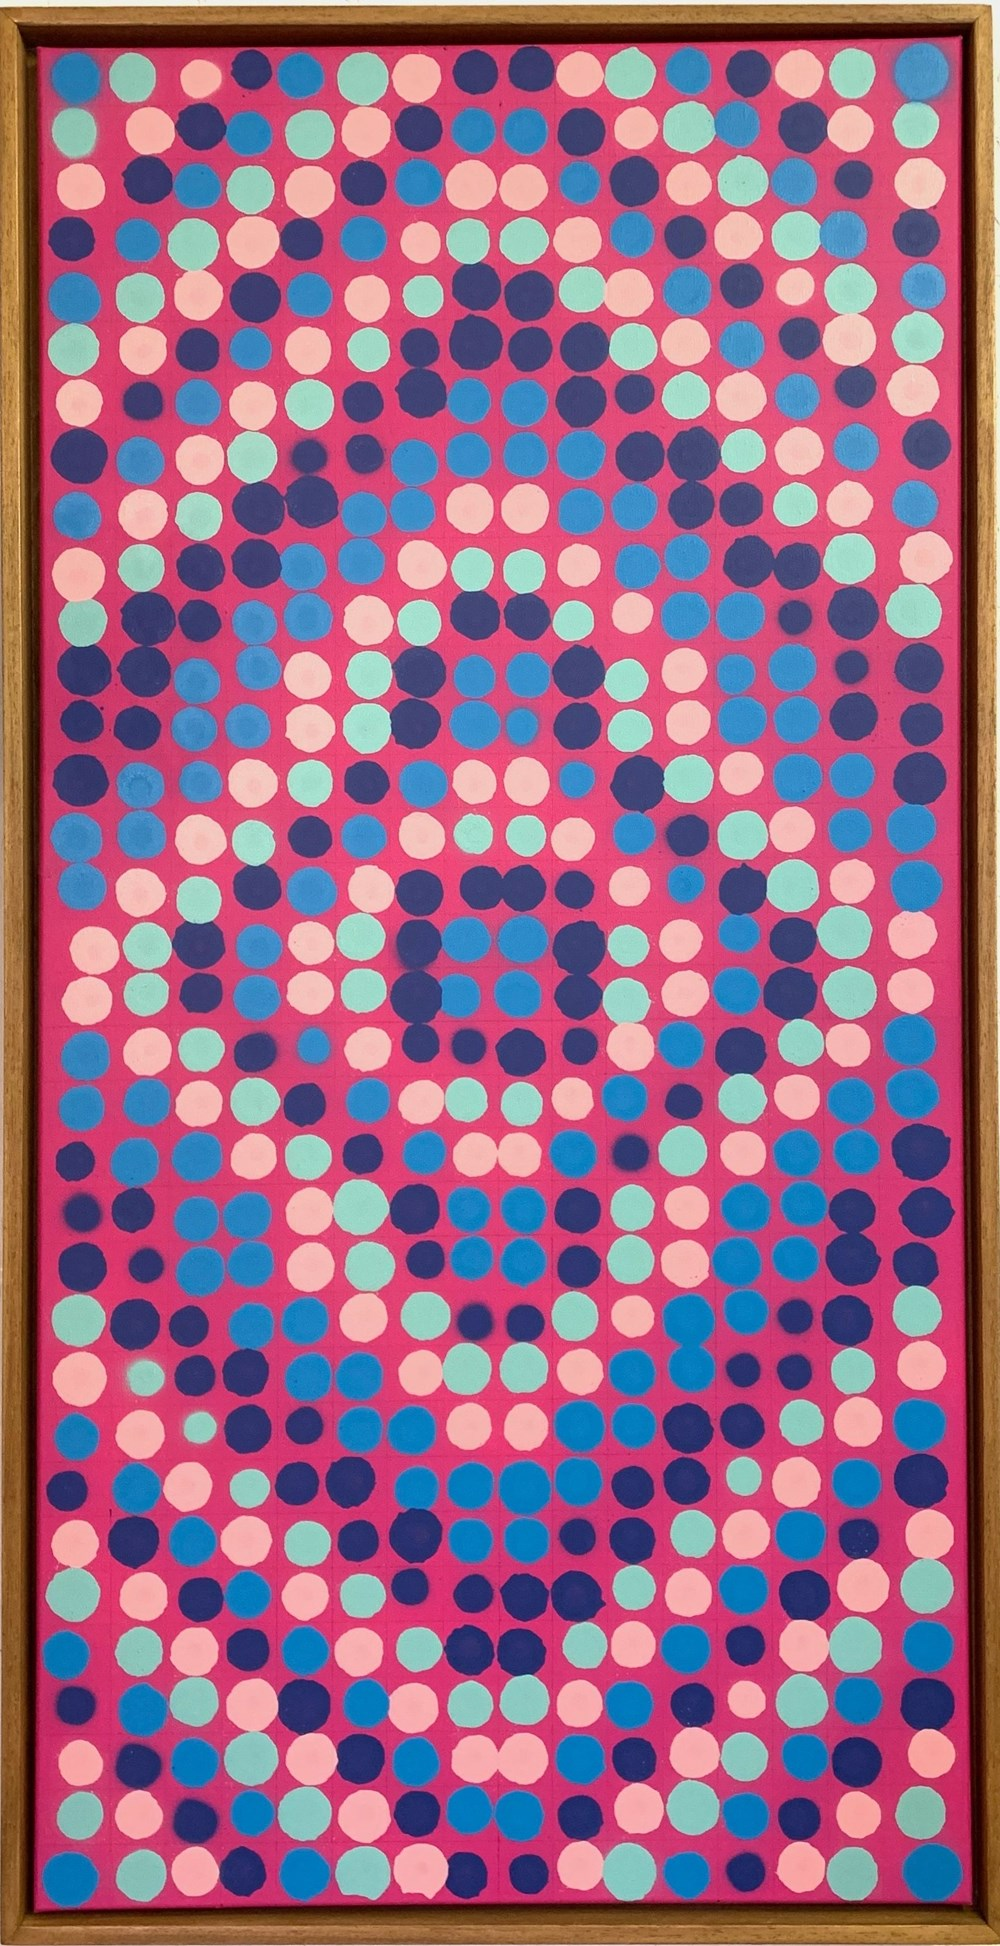 The Autumn Auction 2020 - Lot 15, Dominic Beattie, Untitled, 2020